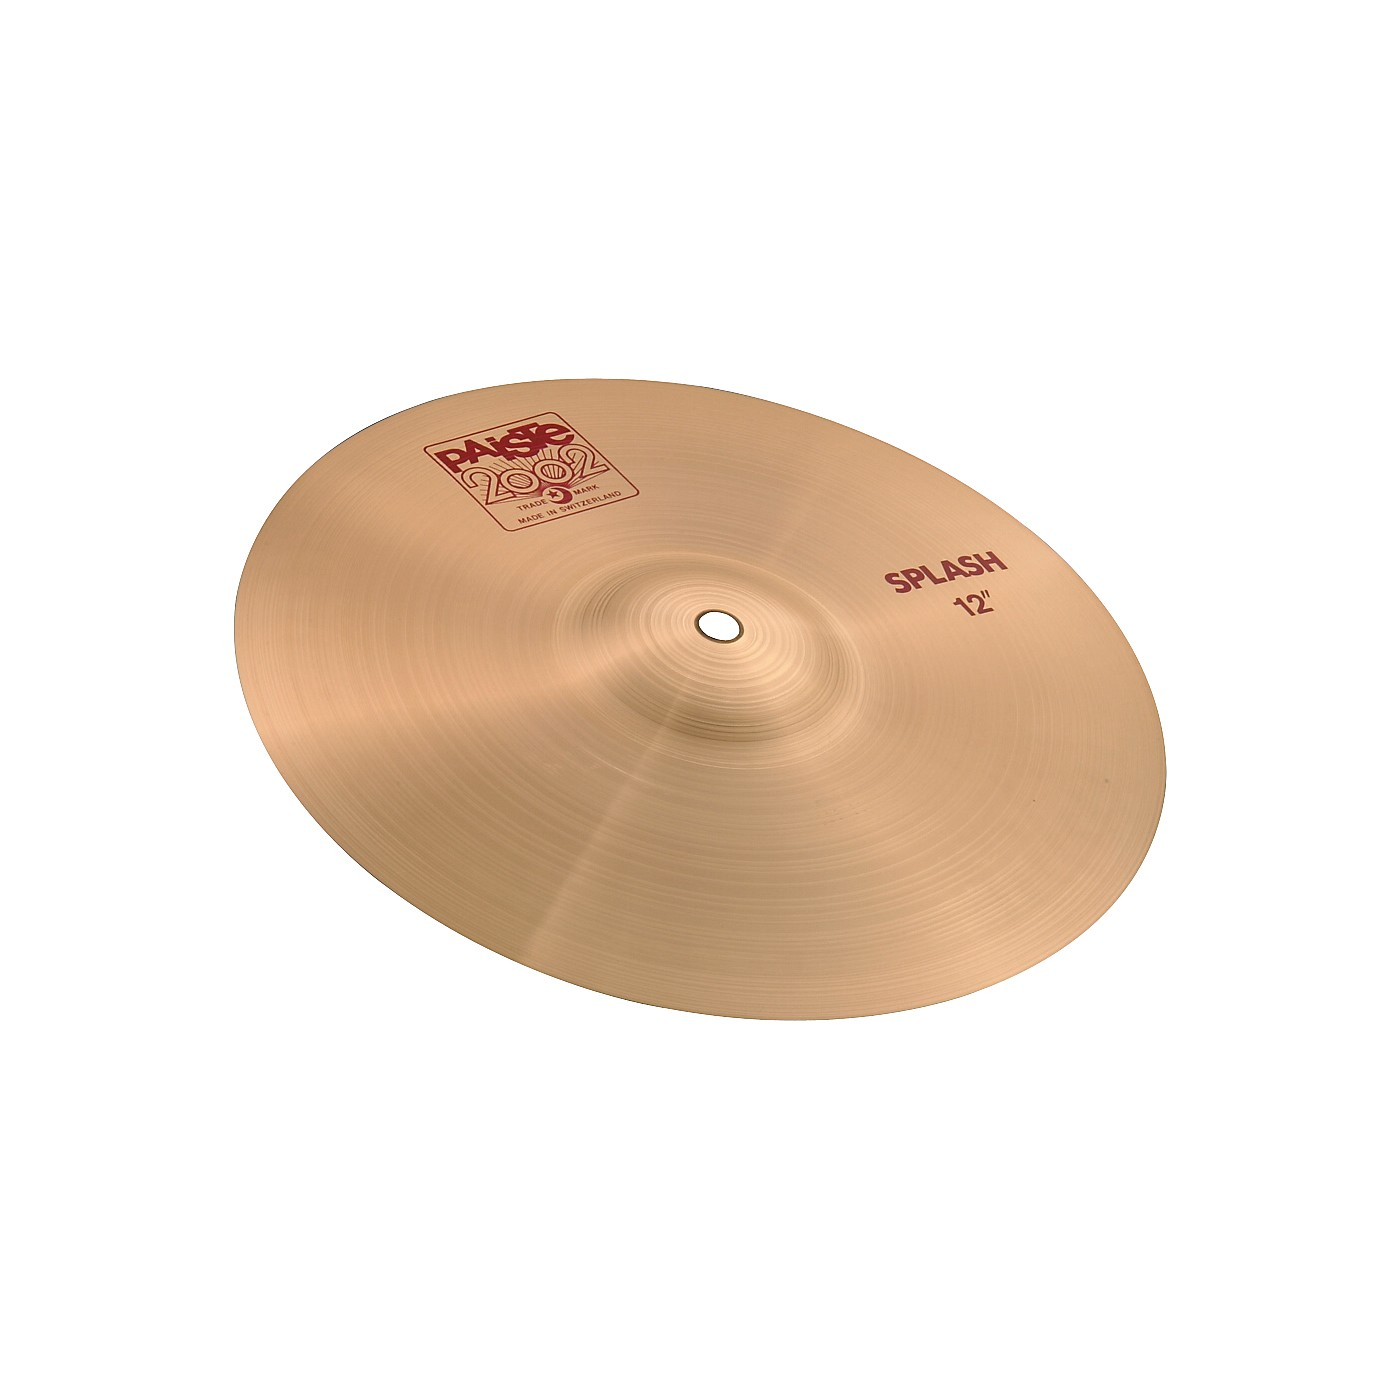 Paiste 2002 Splash Cymbal thumbnail